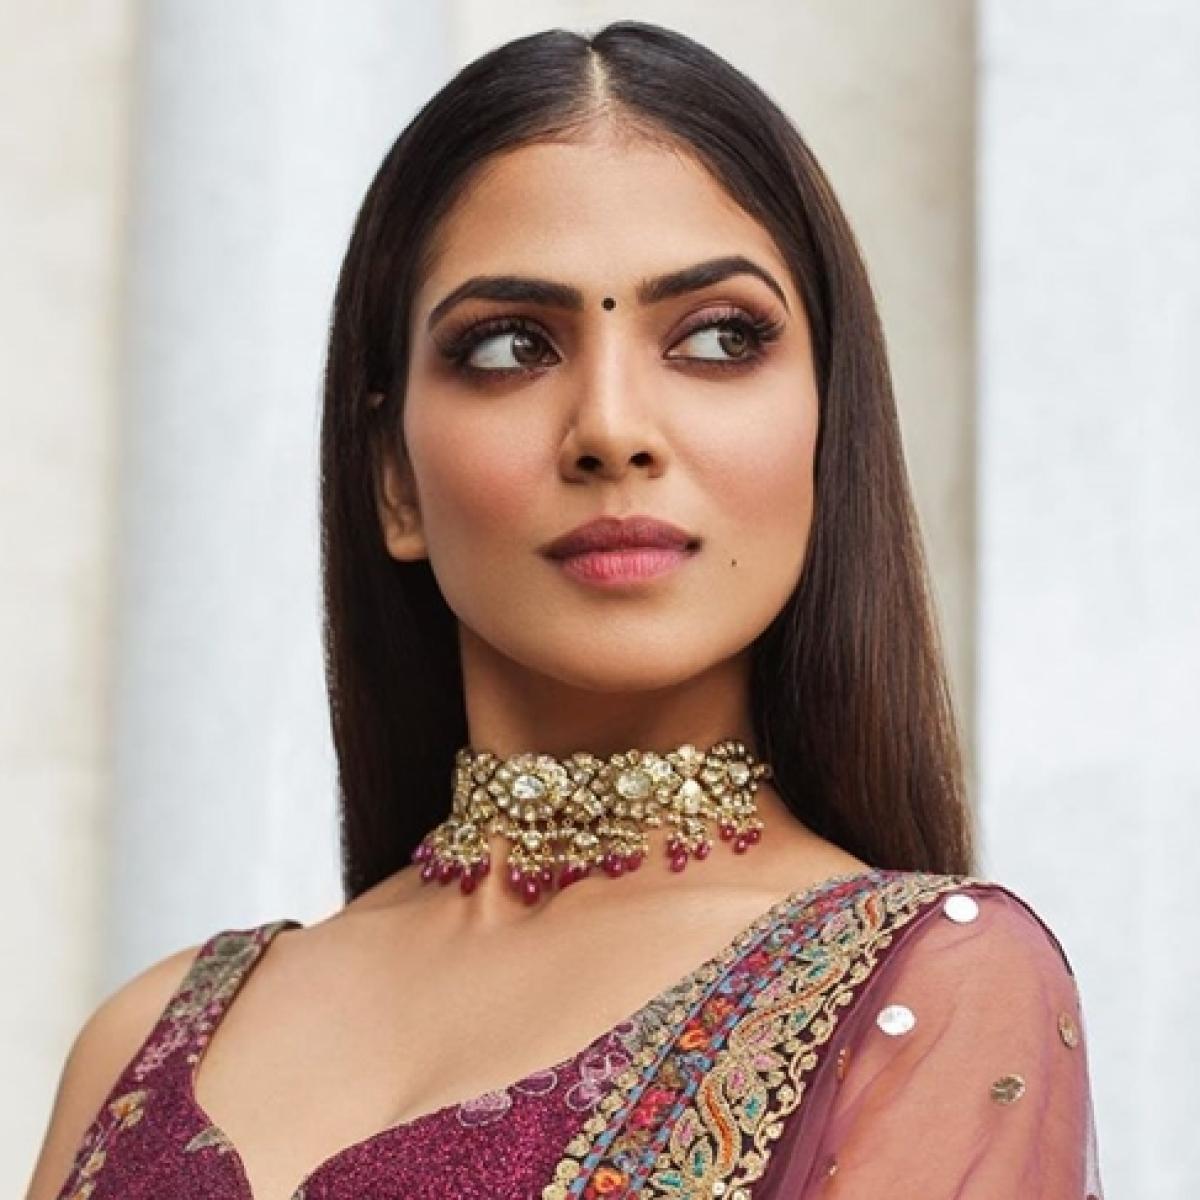 'Master' actress Malavika Mohanan calls out sexist tweet, then deletes it